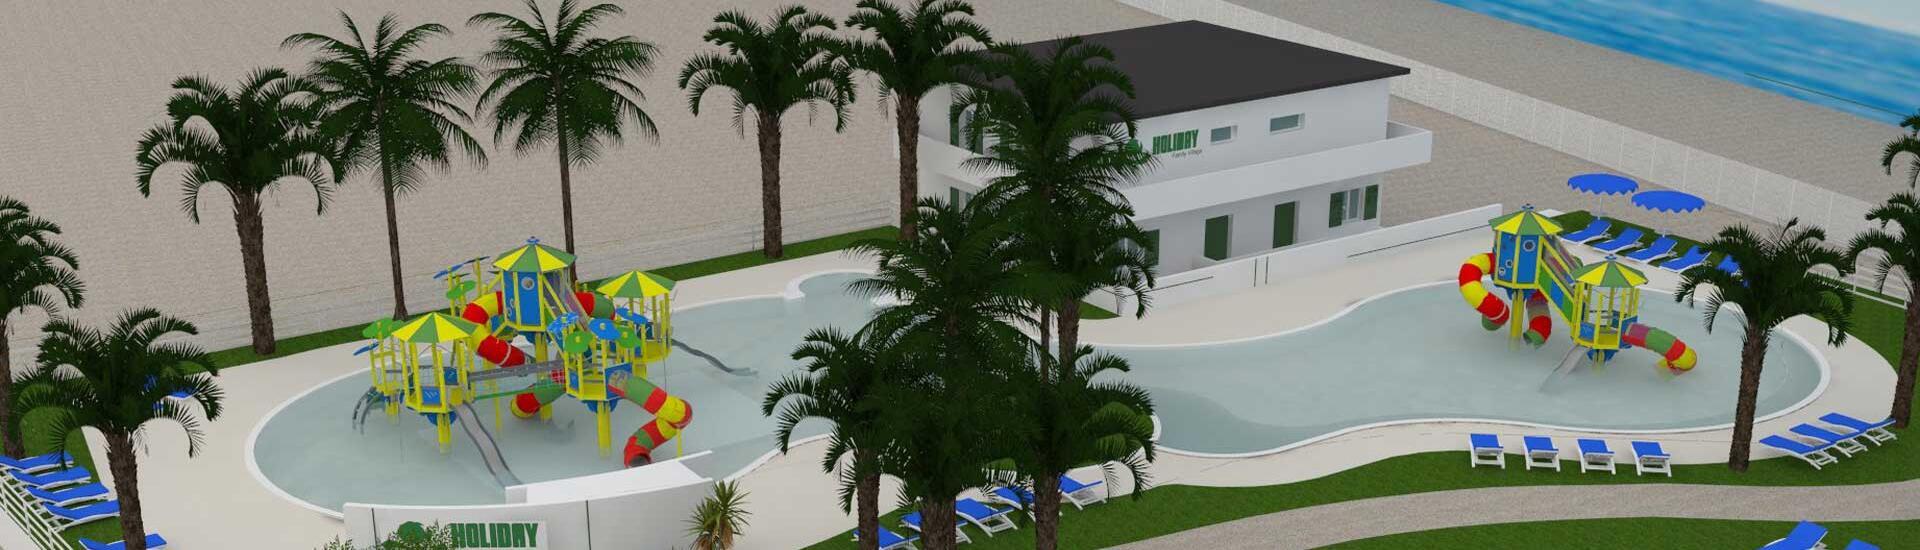 holidayfamilyvillage de pools 011